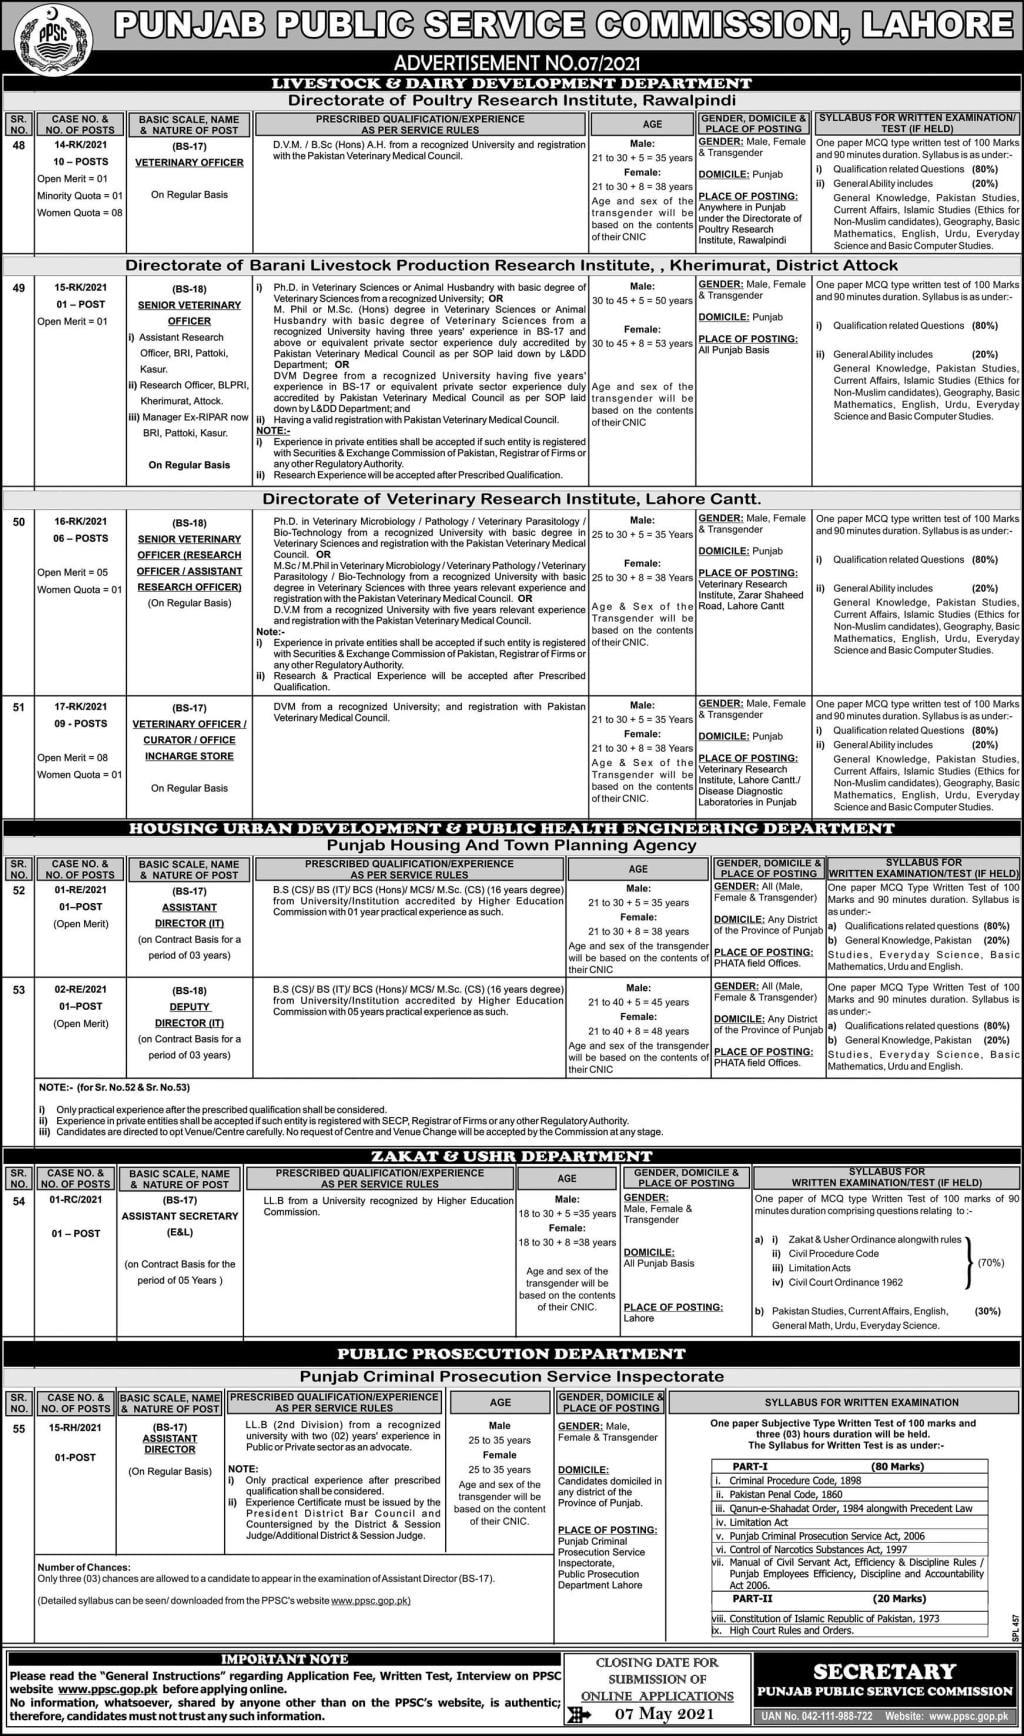 PPSC Jobs Vacancies on Punjab Public Service Commission Apply Online 2021 jobs